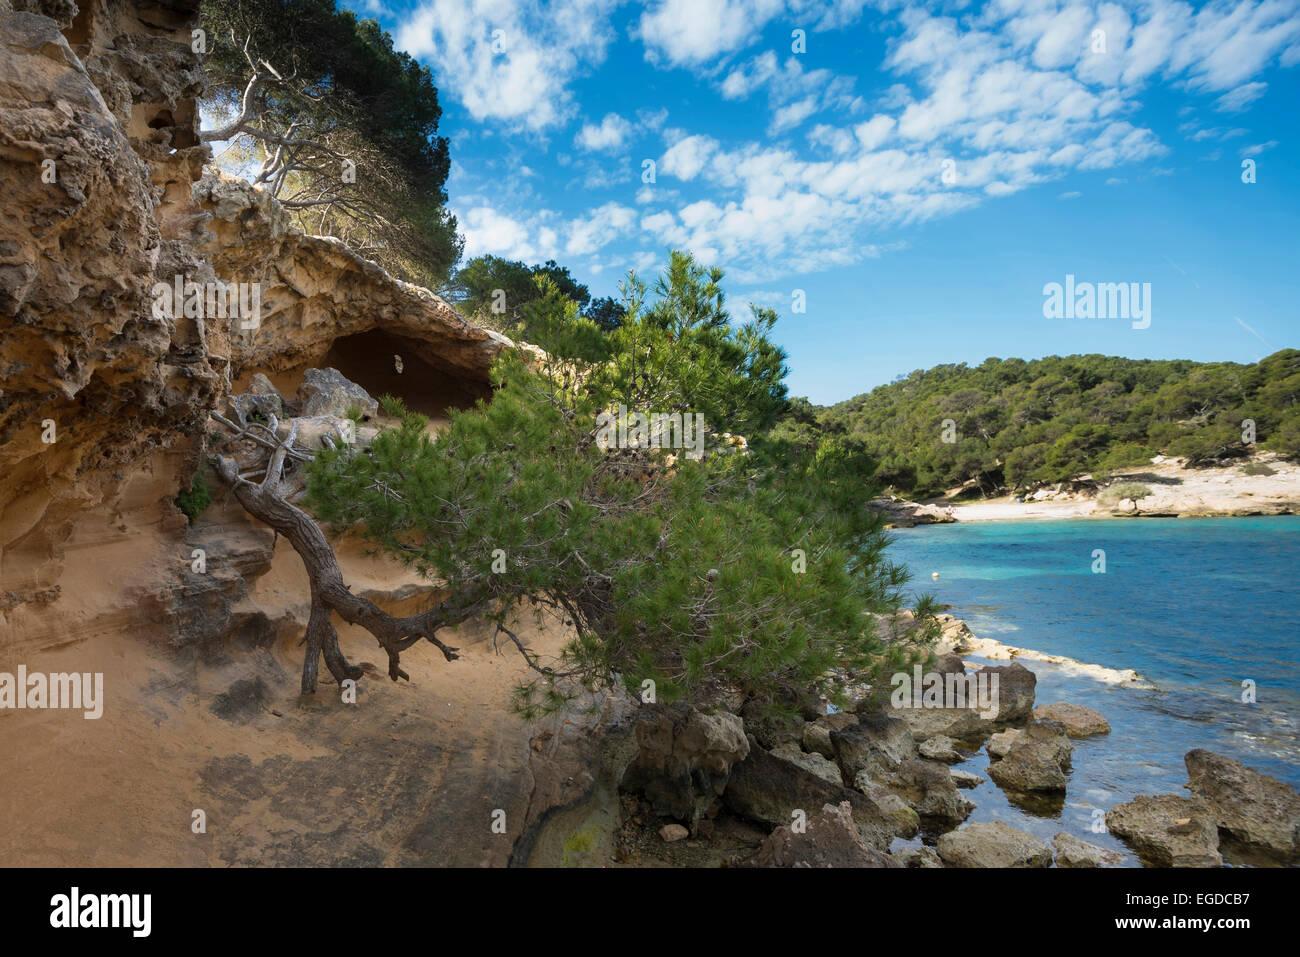 Cala Portals Vells, near Palma de Mallorca, Majorca, Spain - Stock Image